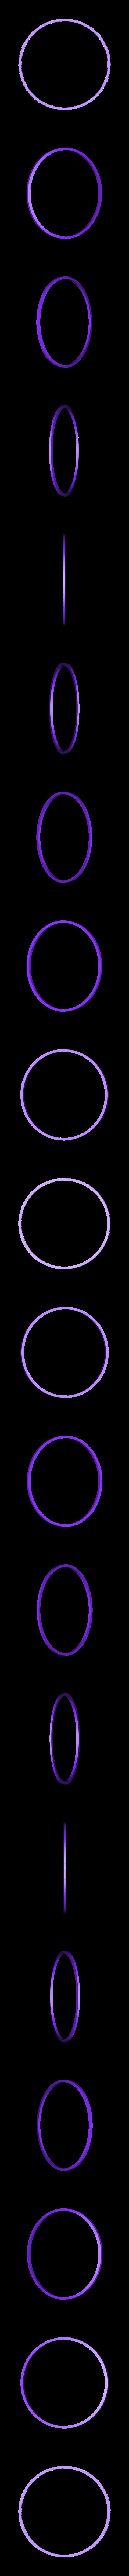 logo_psg_120_dome_ring.STL Download free STL file PSG Logo Badge Dome Version • 3D printer model, lulu3Dbuilder